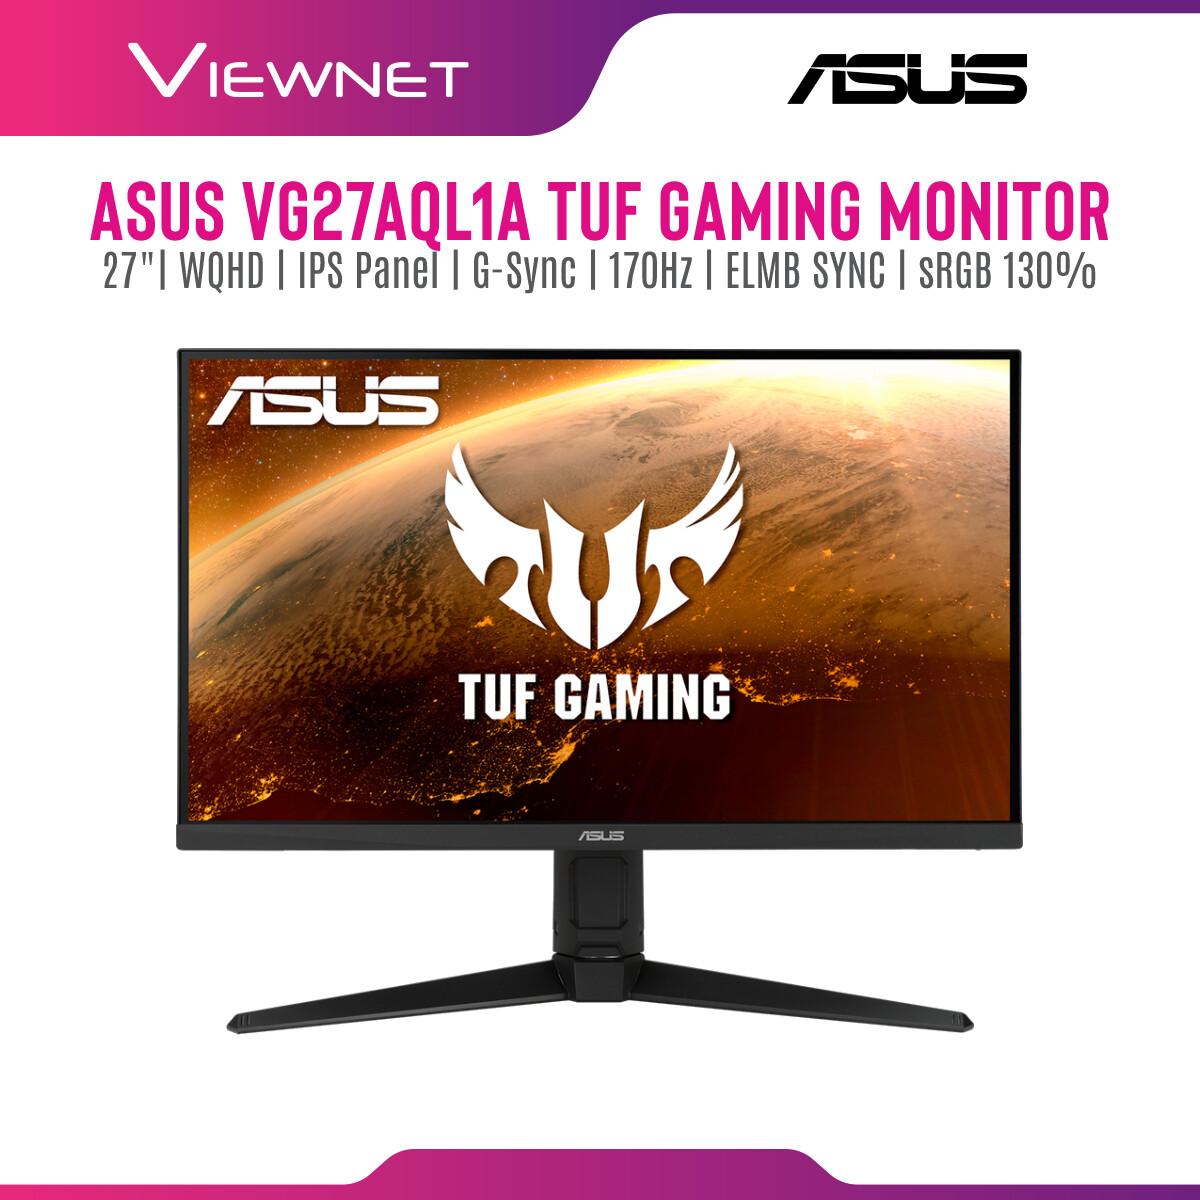 Asus TUF Gaming VG27AQL1A G-SYNC Compatible Gaming Monitor –27 inch WQHD (2560x1440), IPS,170Hz (above 144Hz), ELMB SYNC, Adaptive-sync, G-Sync compatible ready, 1ms (MPRT), 130 % sRGB, HDR